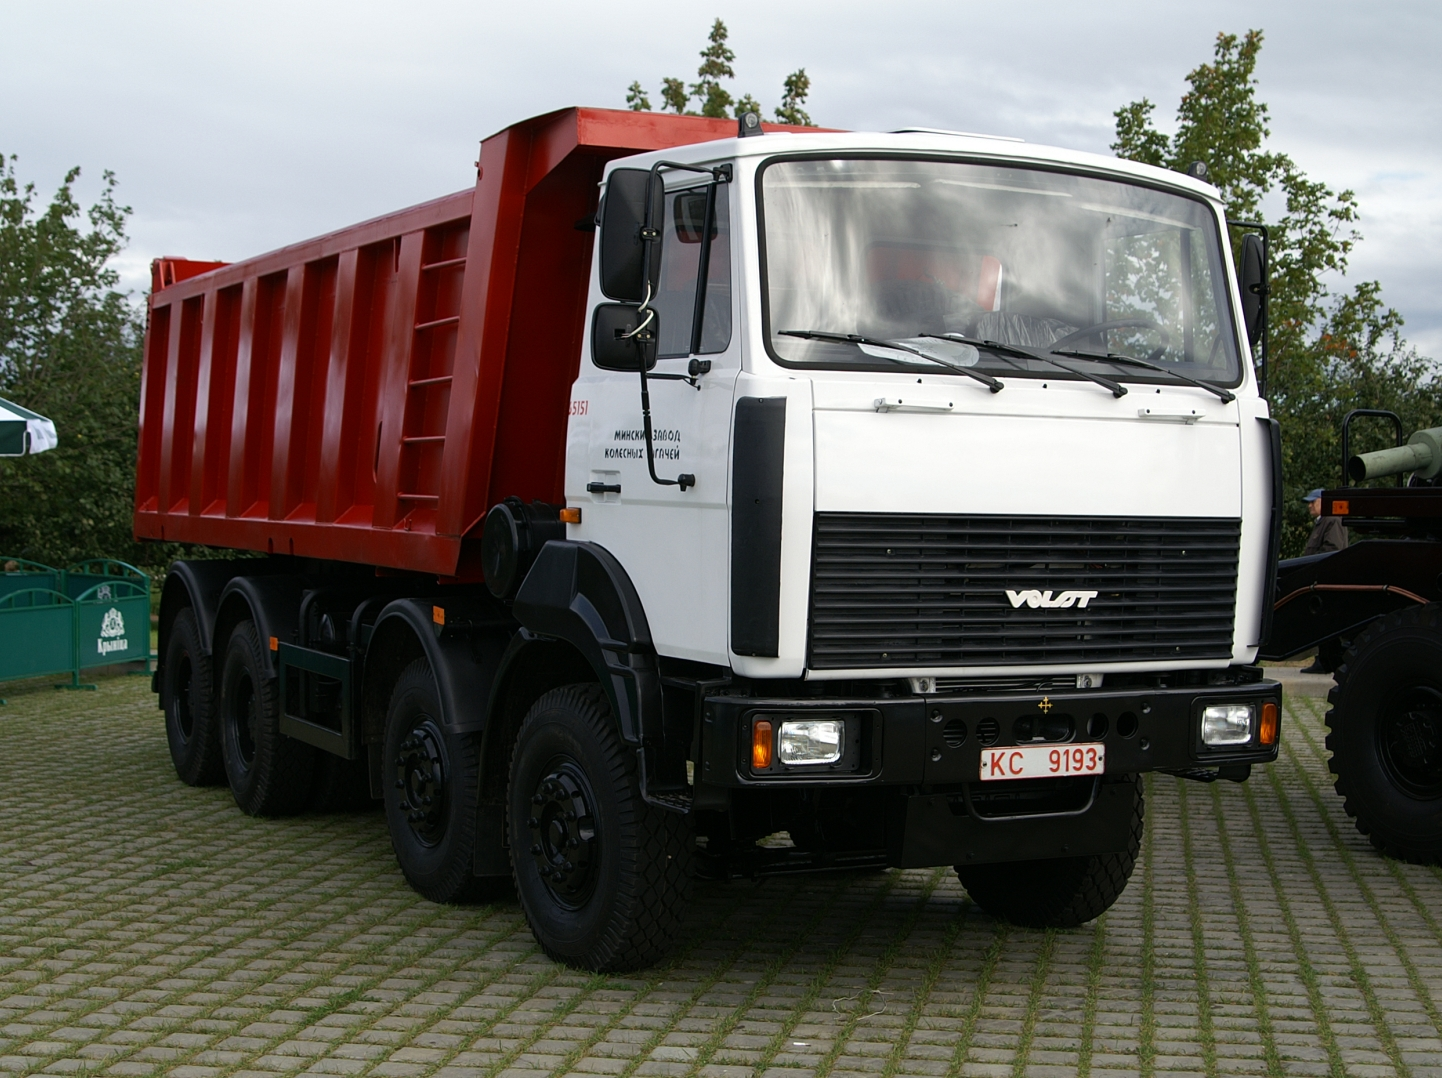 65151-010